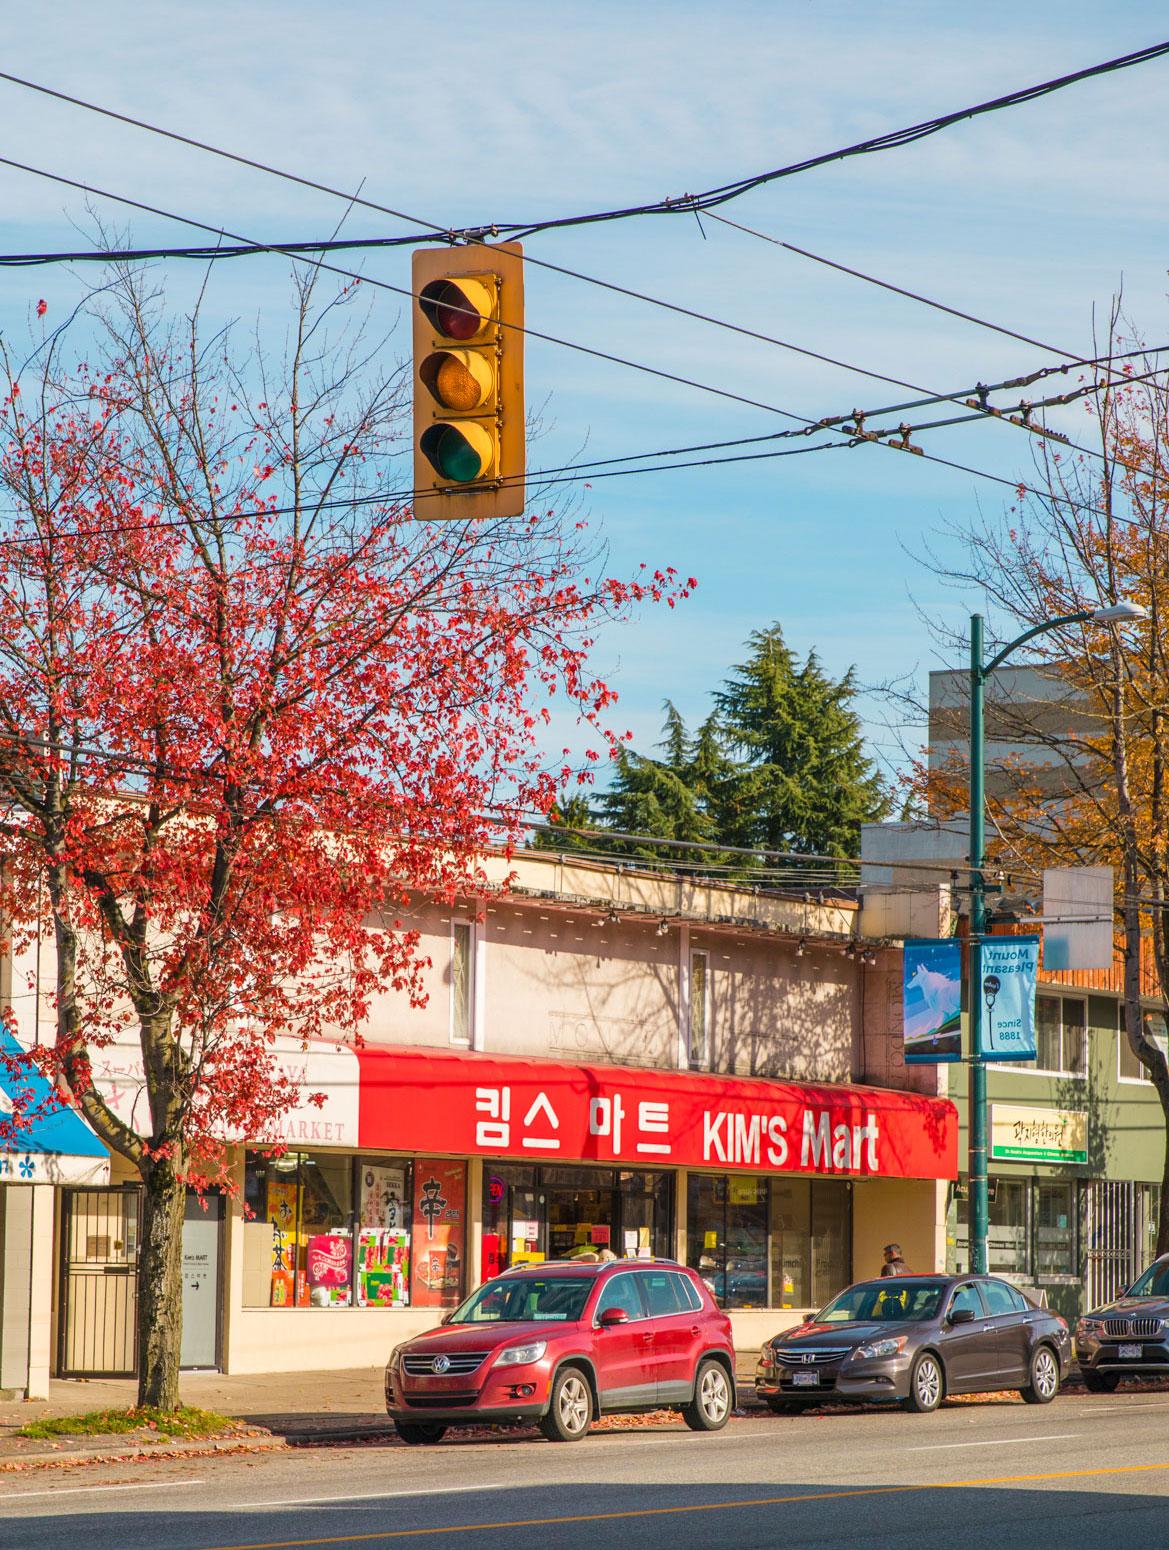 Kim's Market from across the street on Broadway